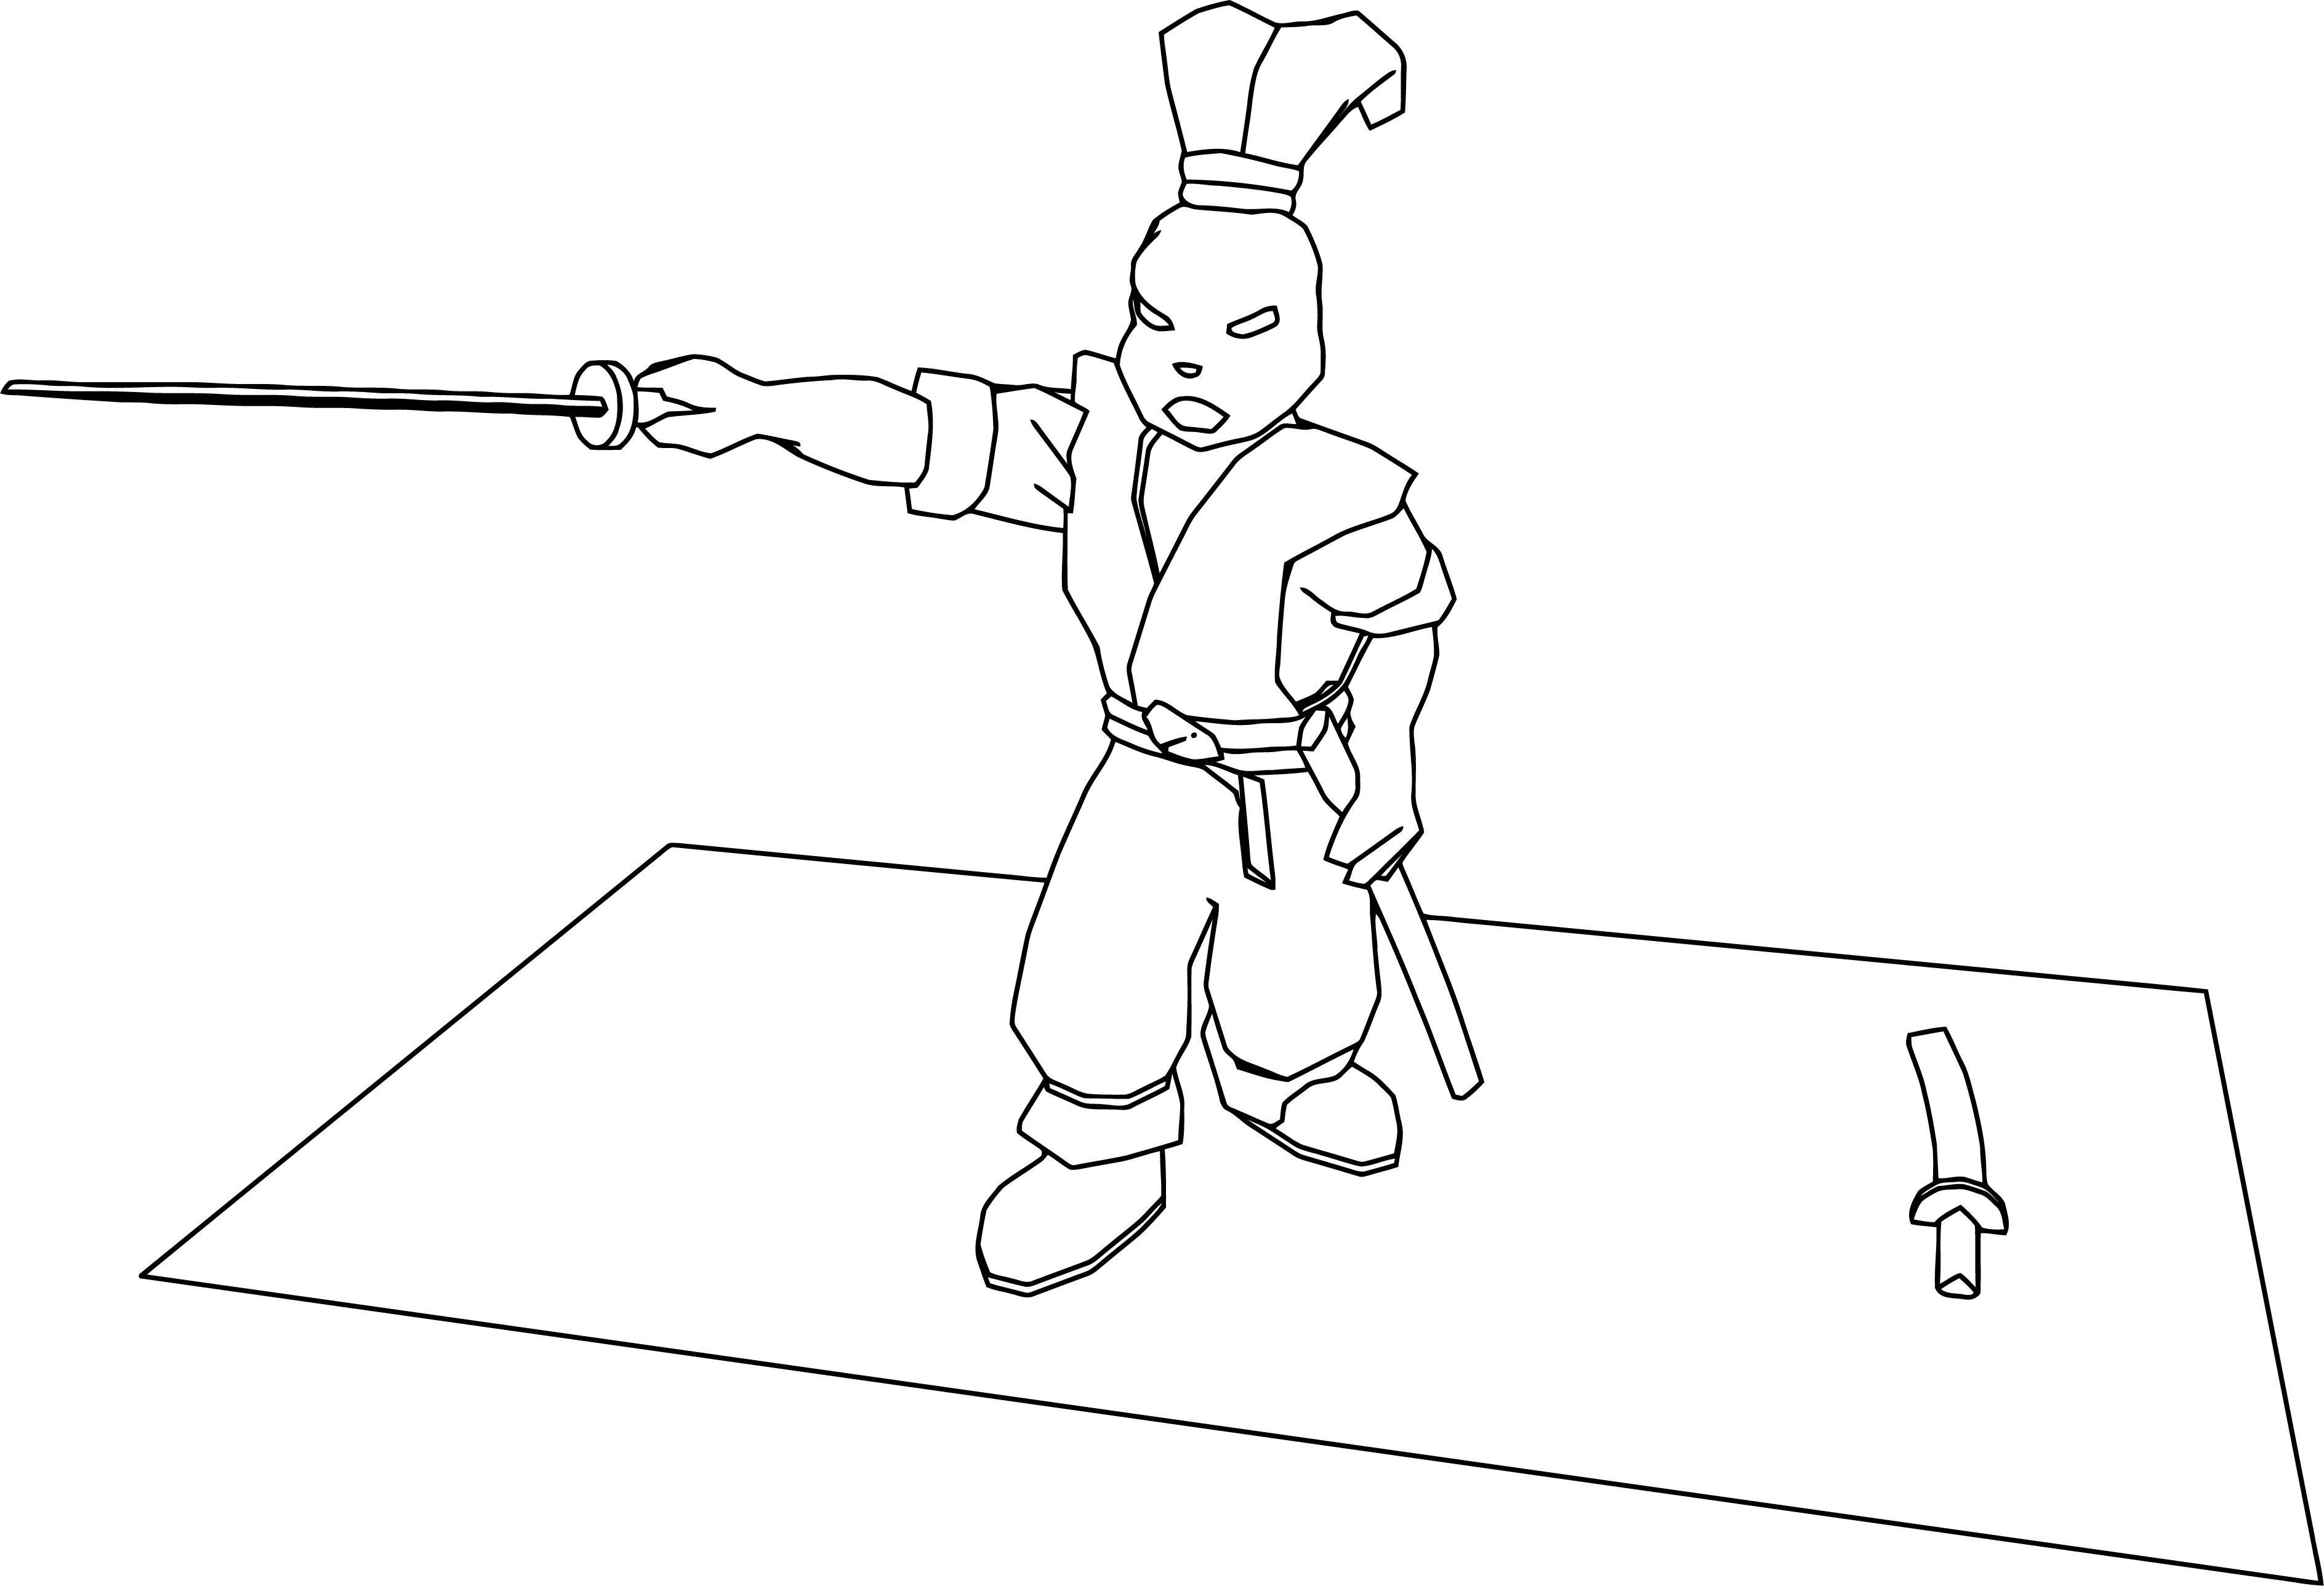 Manga Ninja Rabbit Sword Coloring Page Wecoloringpage Com